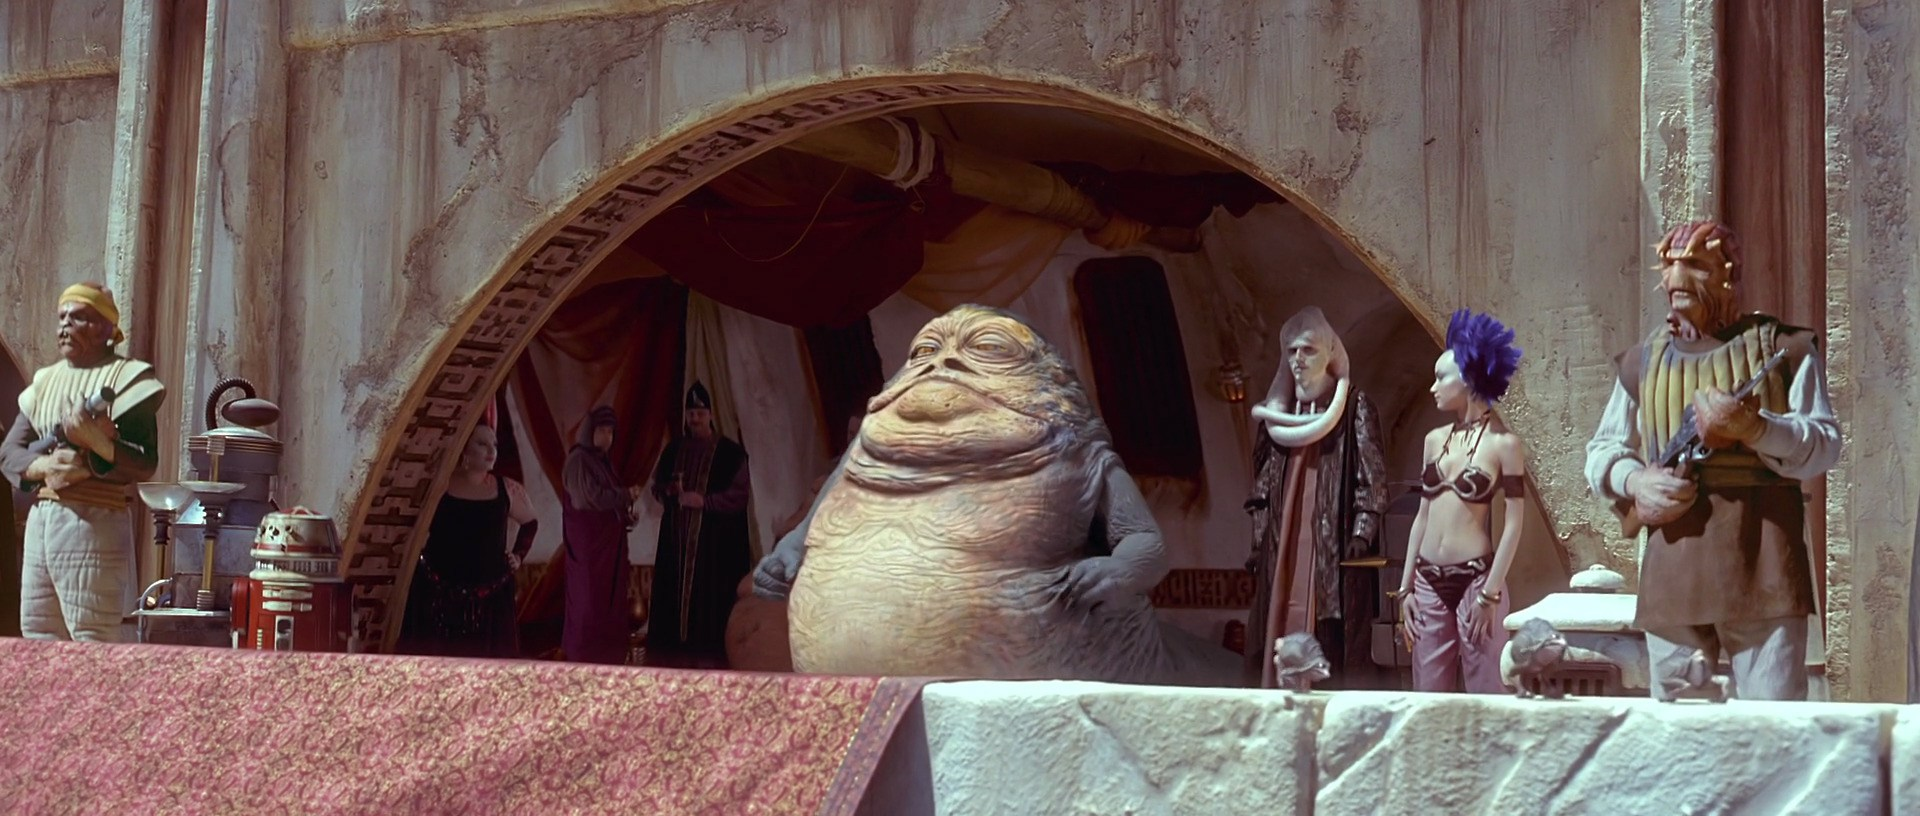 Jabba the Hutt/Gallery